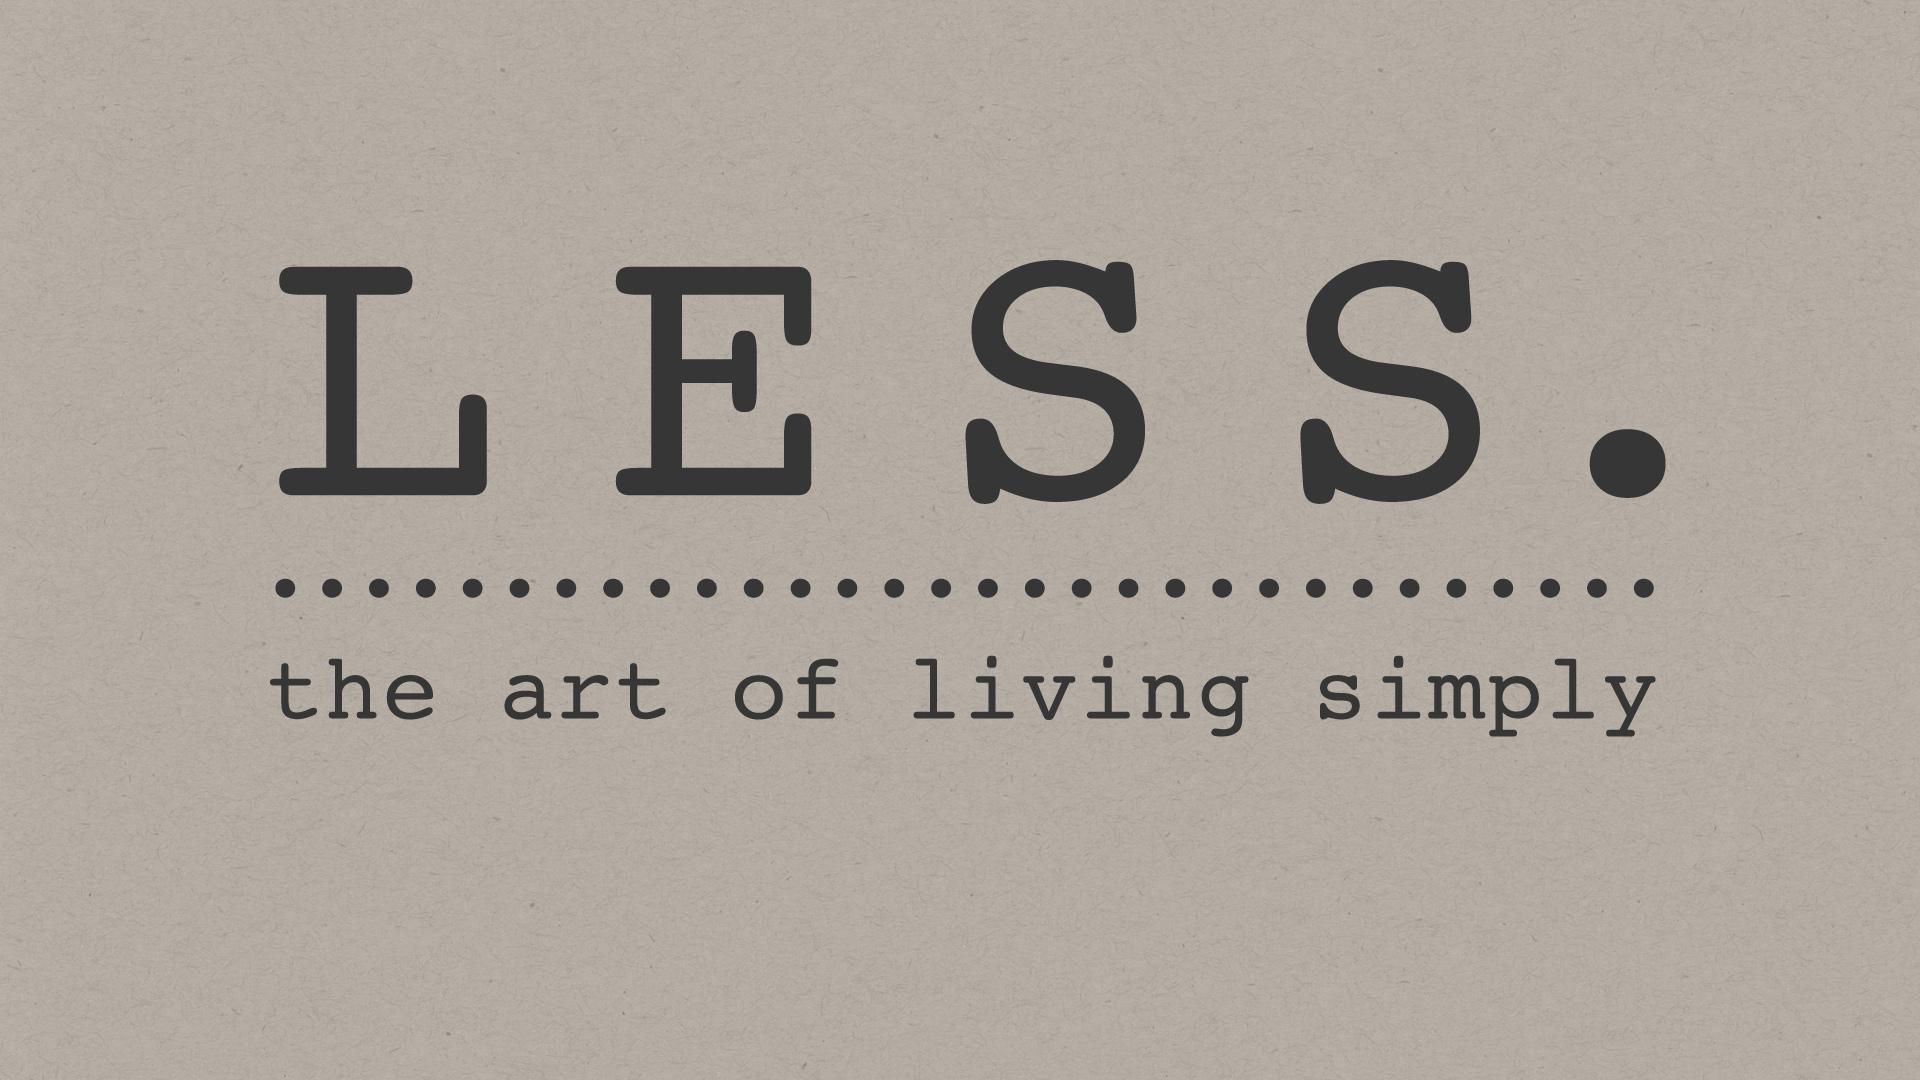 Less_Series-Title.jpg